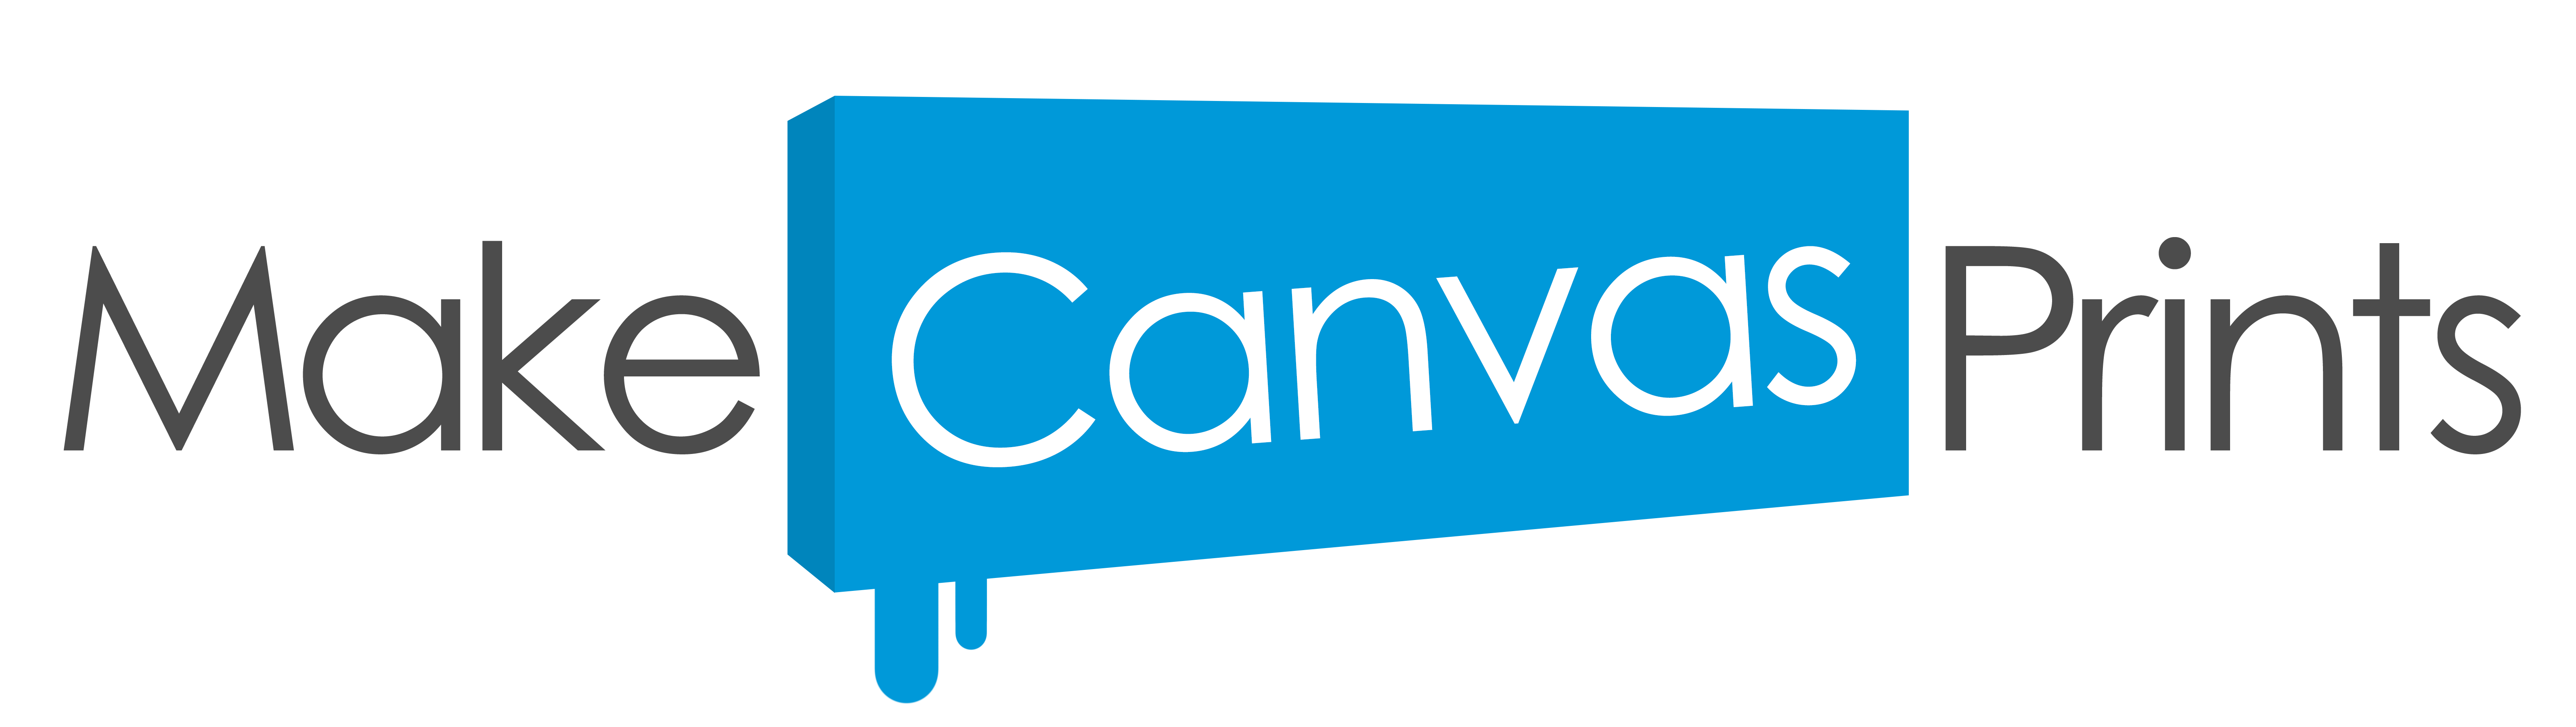 Design your own large canvas print makecanvasprints for Best place to order canvas prints online